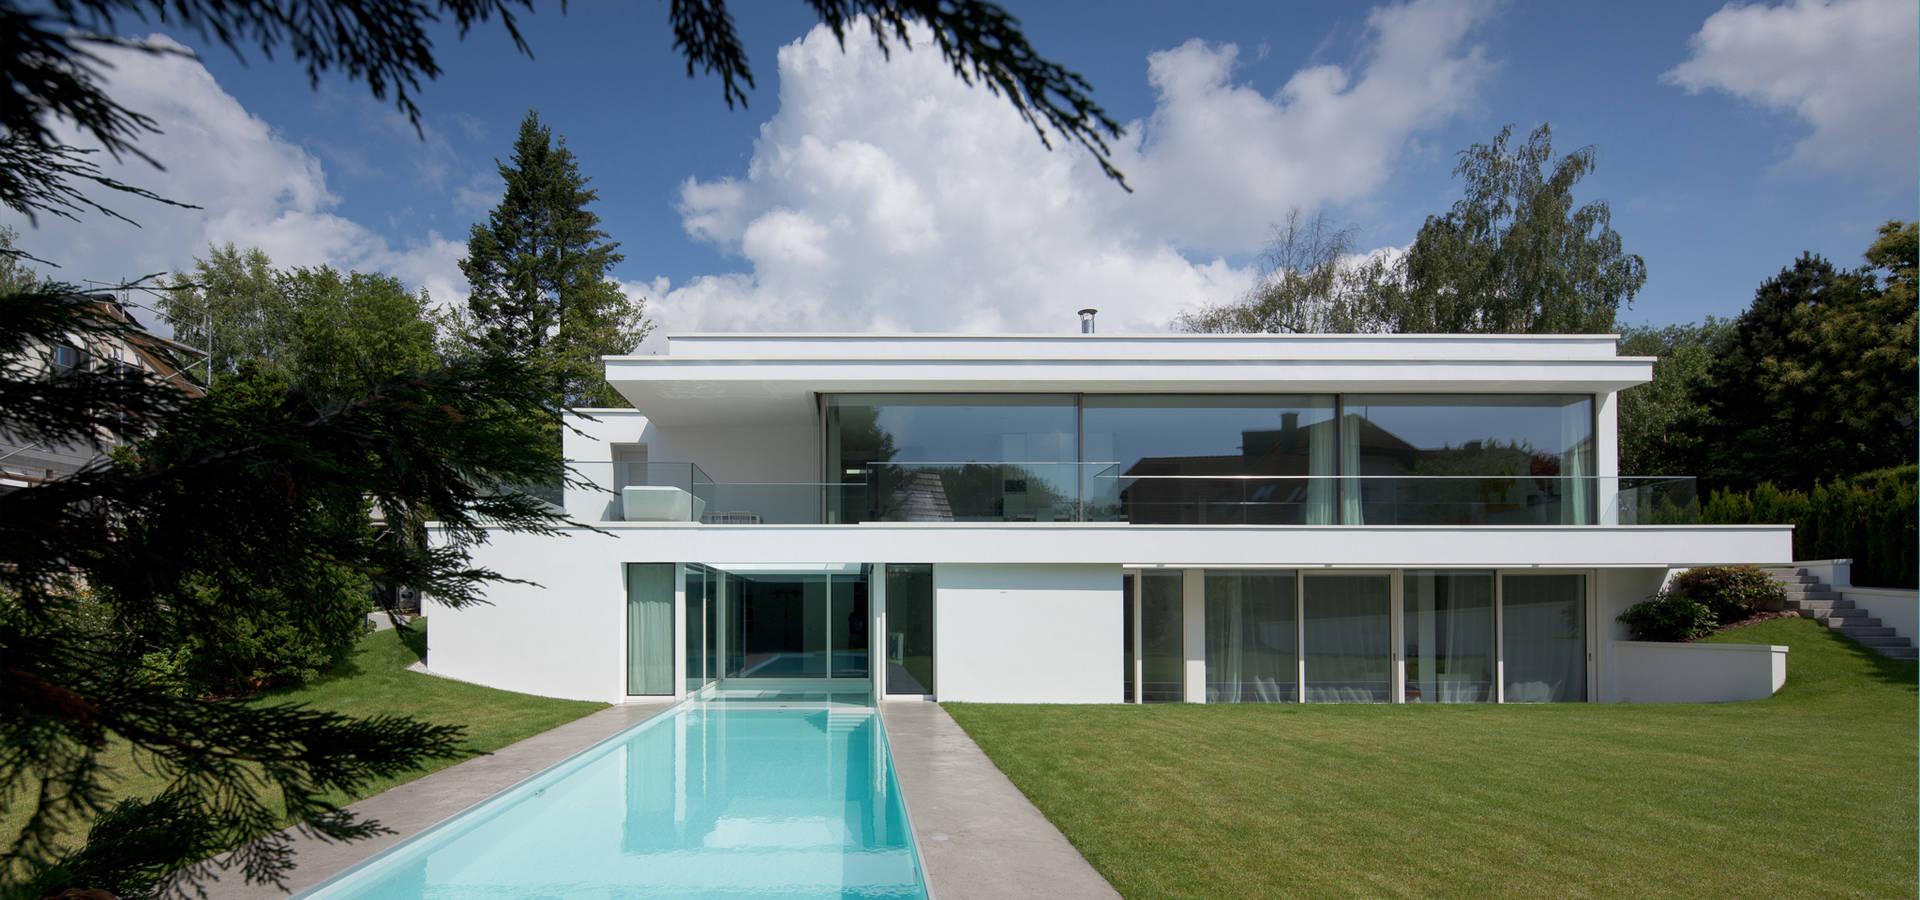 Villa p par philipp architekten anna philipp homify - Philipp architekten ...